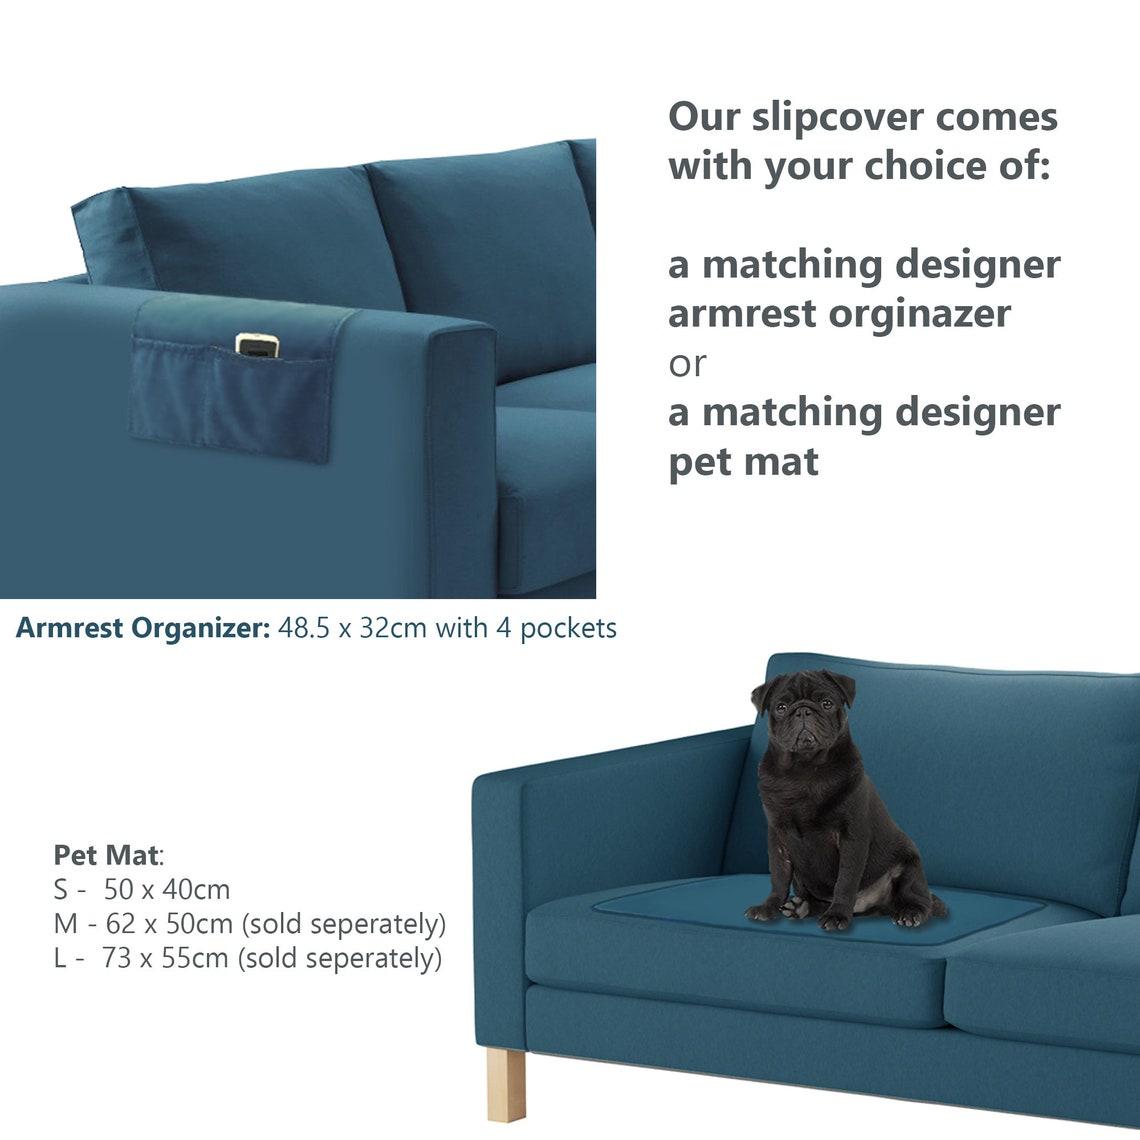 Ektorp Cover, Ikea Ektorp Armchair Cover, Ektorp Slipcover, Ektorp Armchair Cover, Ektorp Slipcover, Ikea Armchair Cover, Custom made